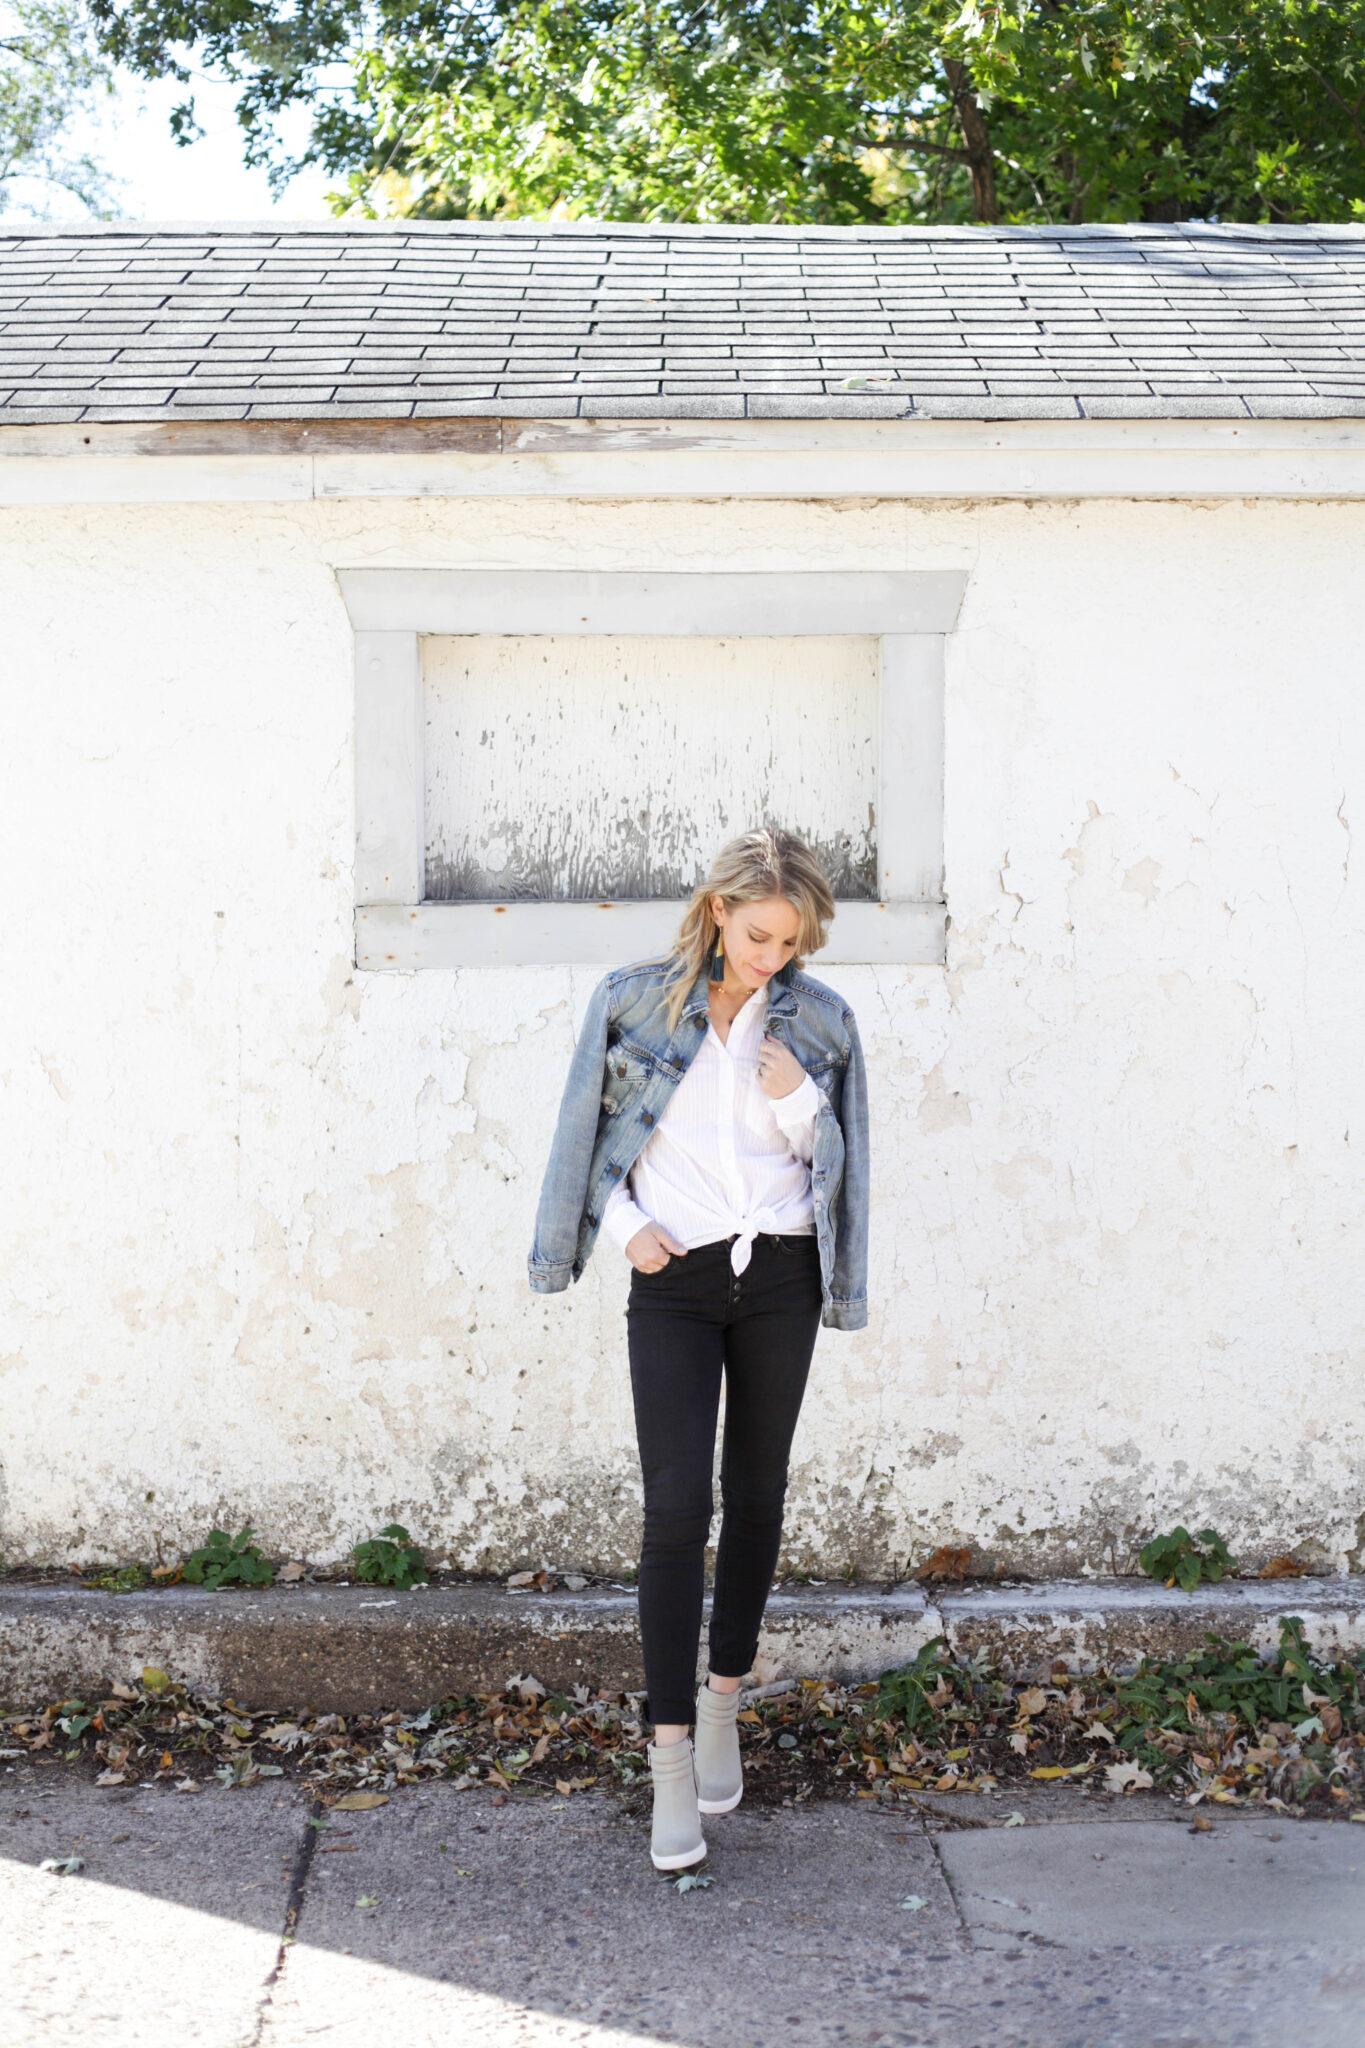 3 Ways to Style a White Button Down - Classic style with dark denim and a denim jacket. #fallstyle #whitebuttondown #styleinspiration